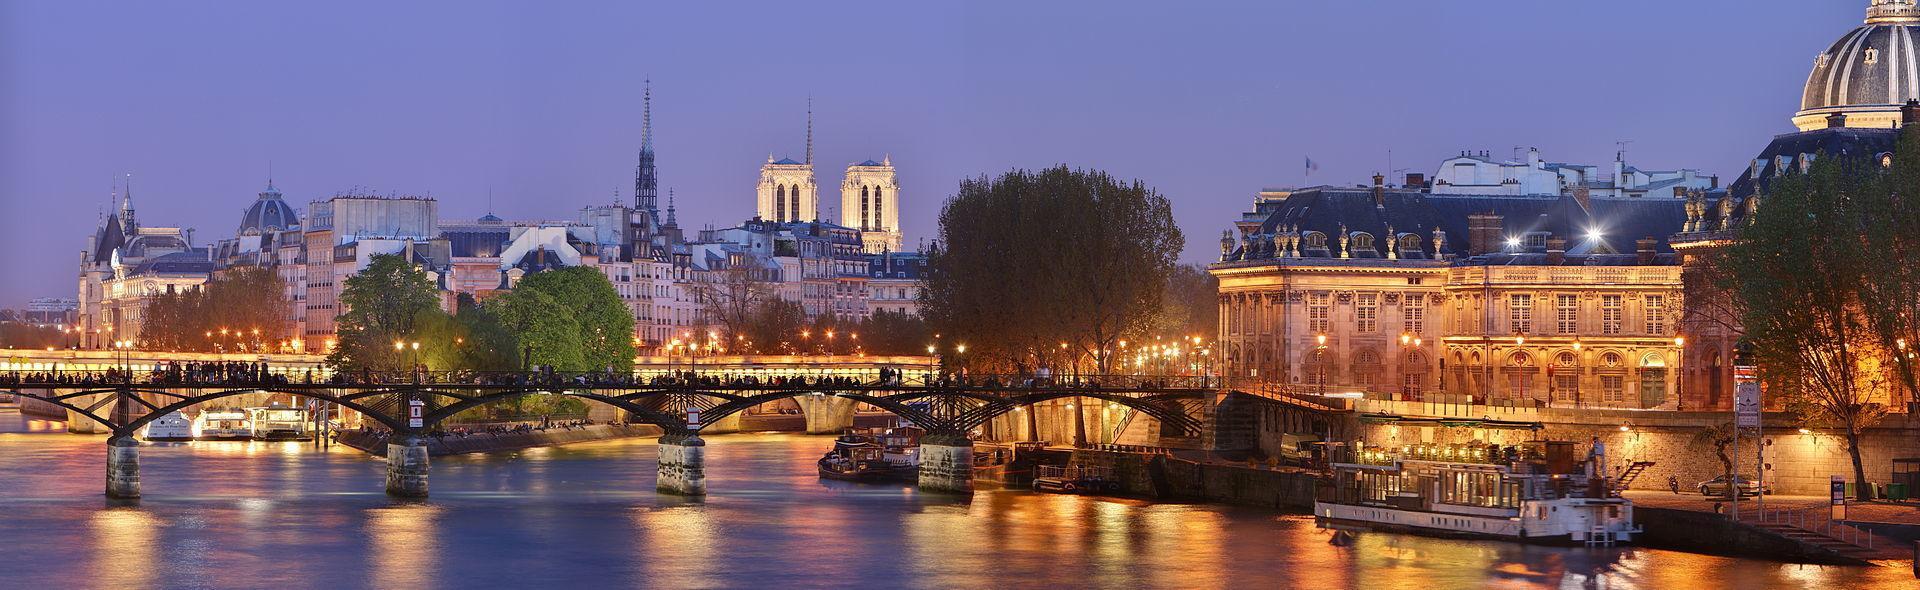 Douce France Visites